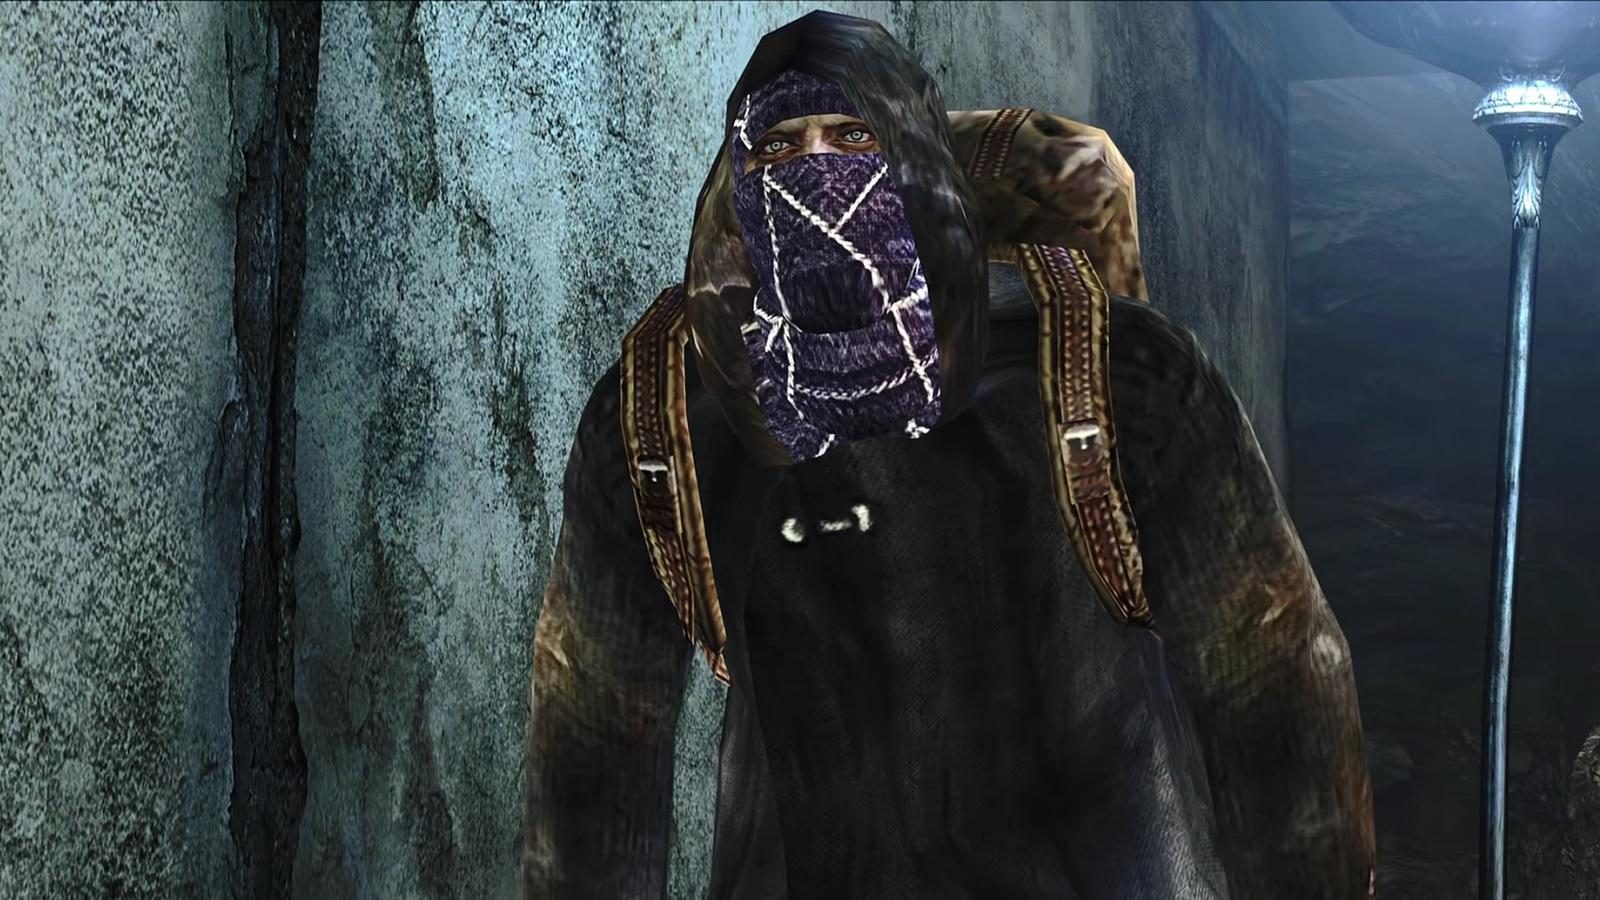 Герцог в Resident Evil Village оказался давним другом торговца из Resident Evil 4